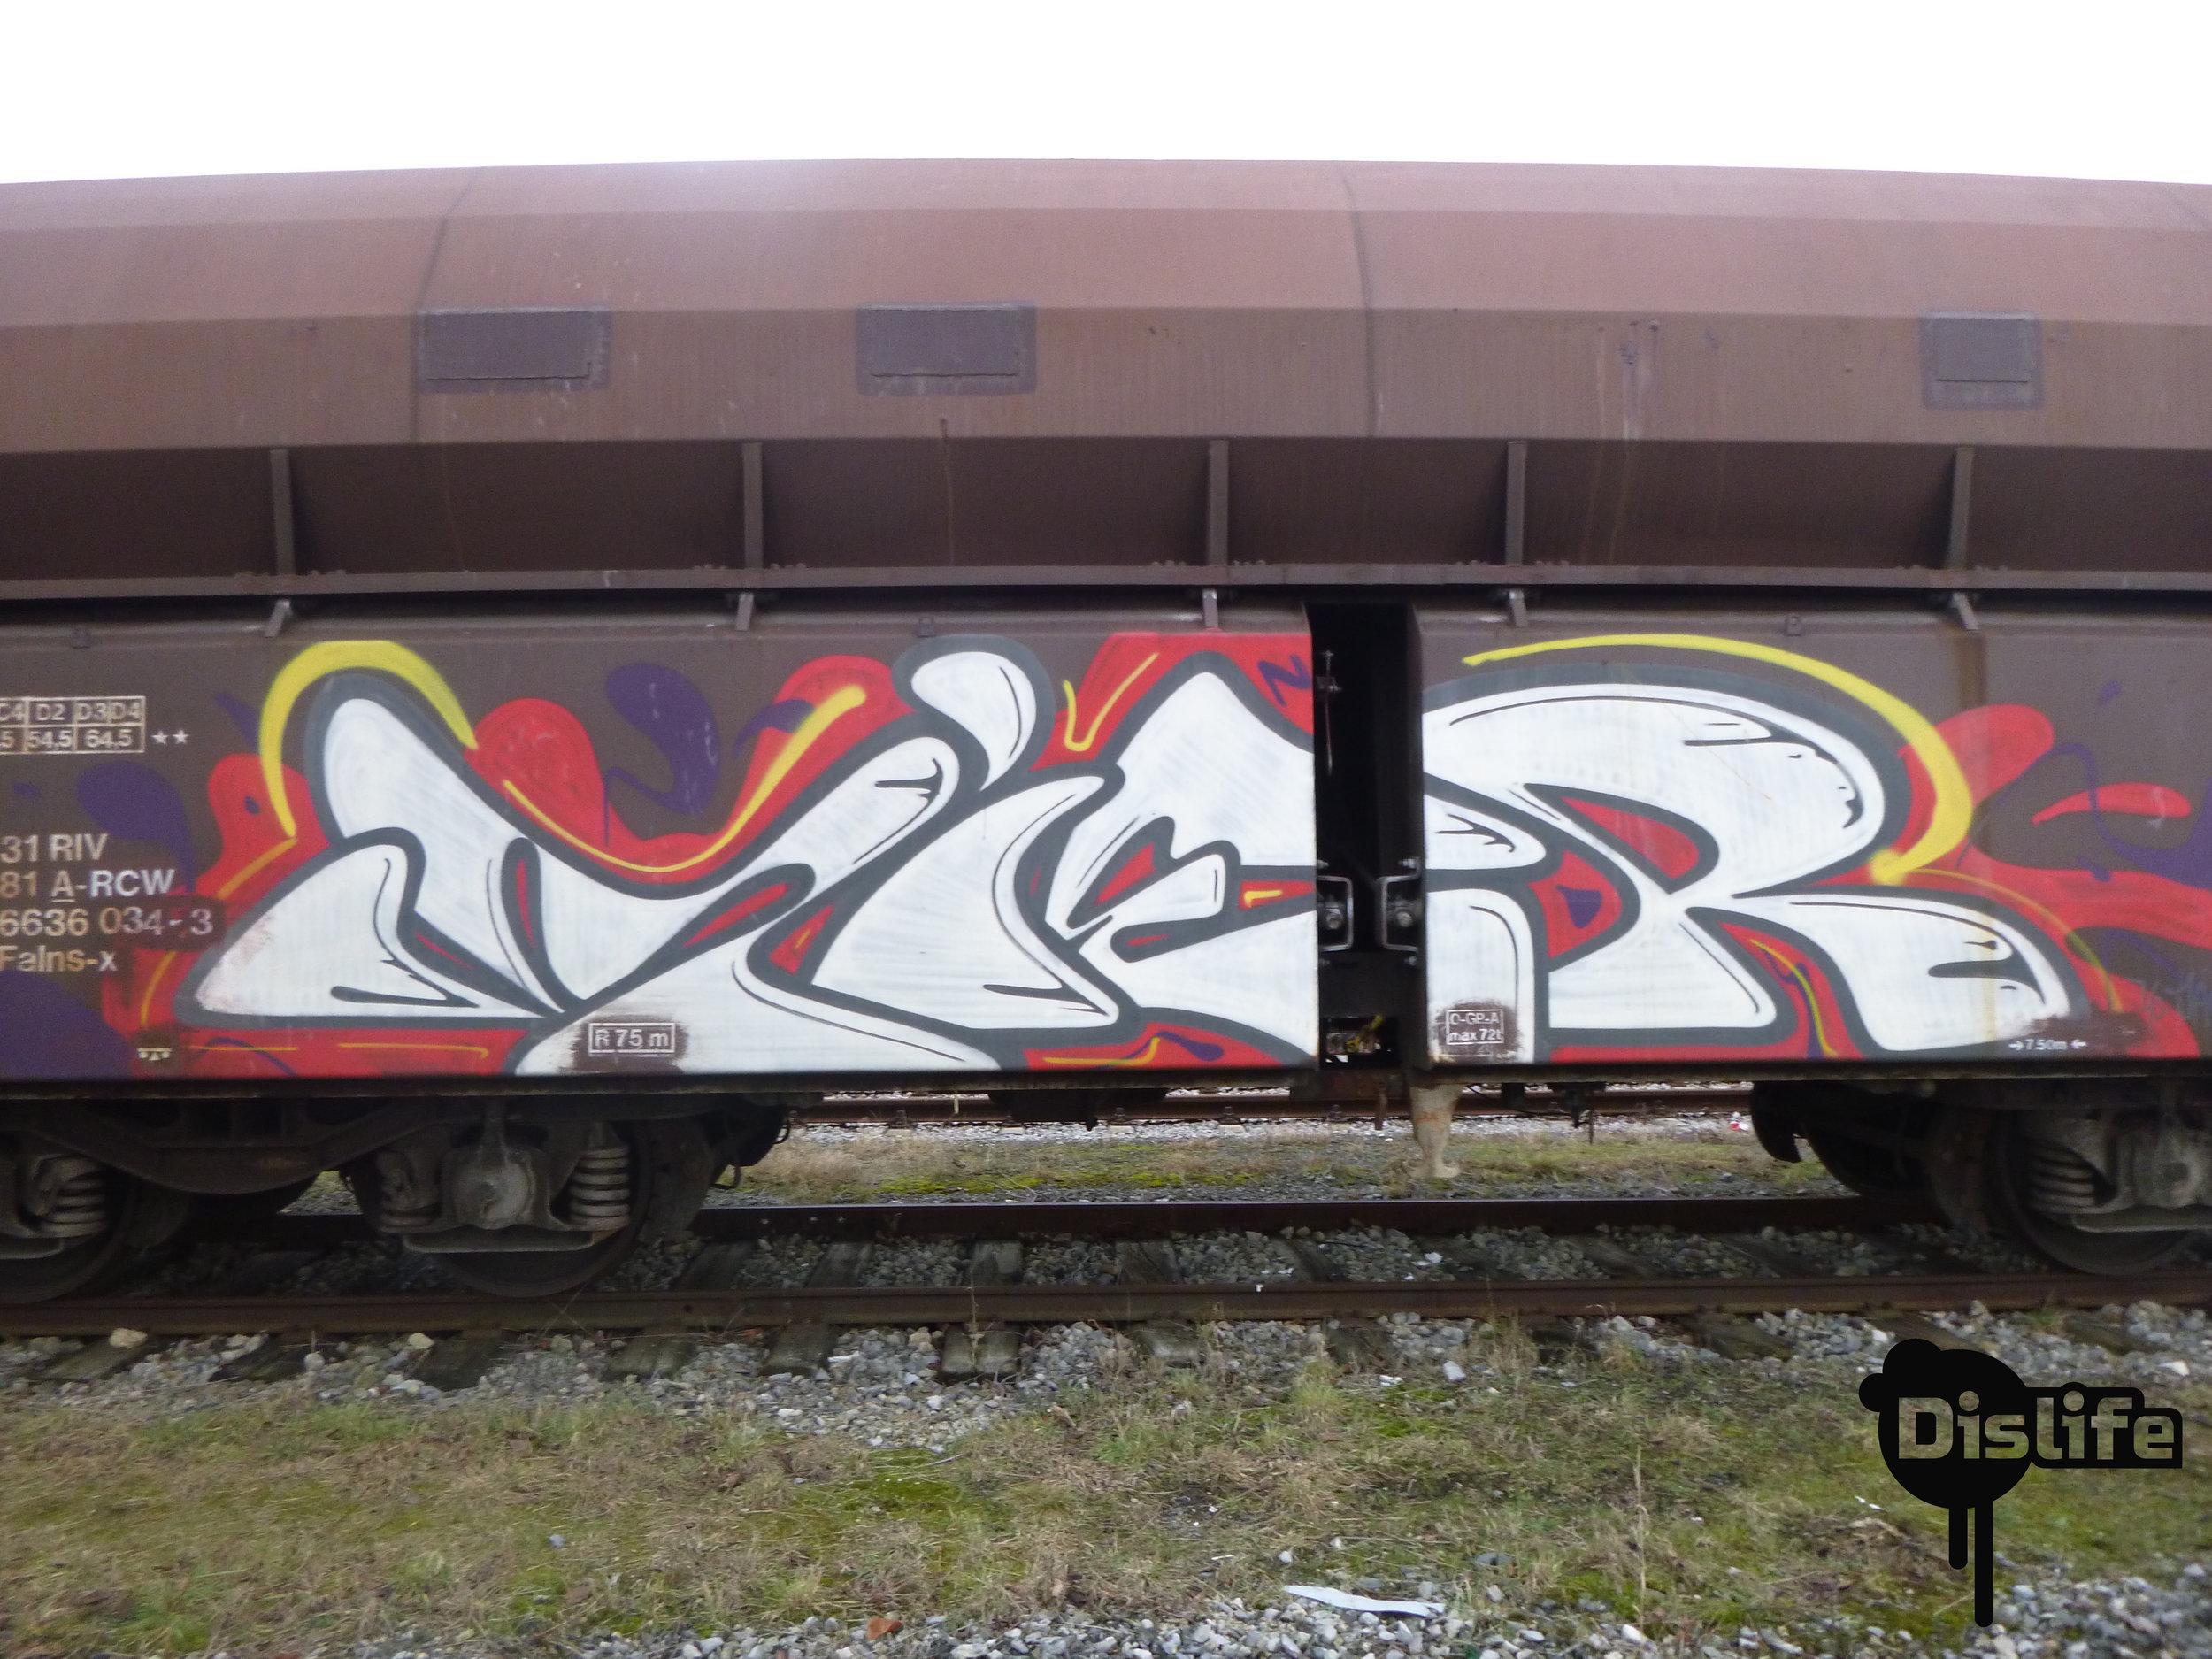 P1020079.JPG